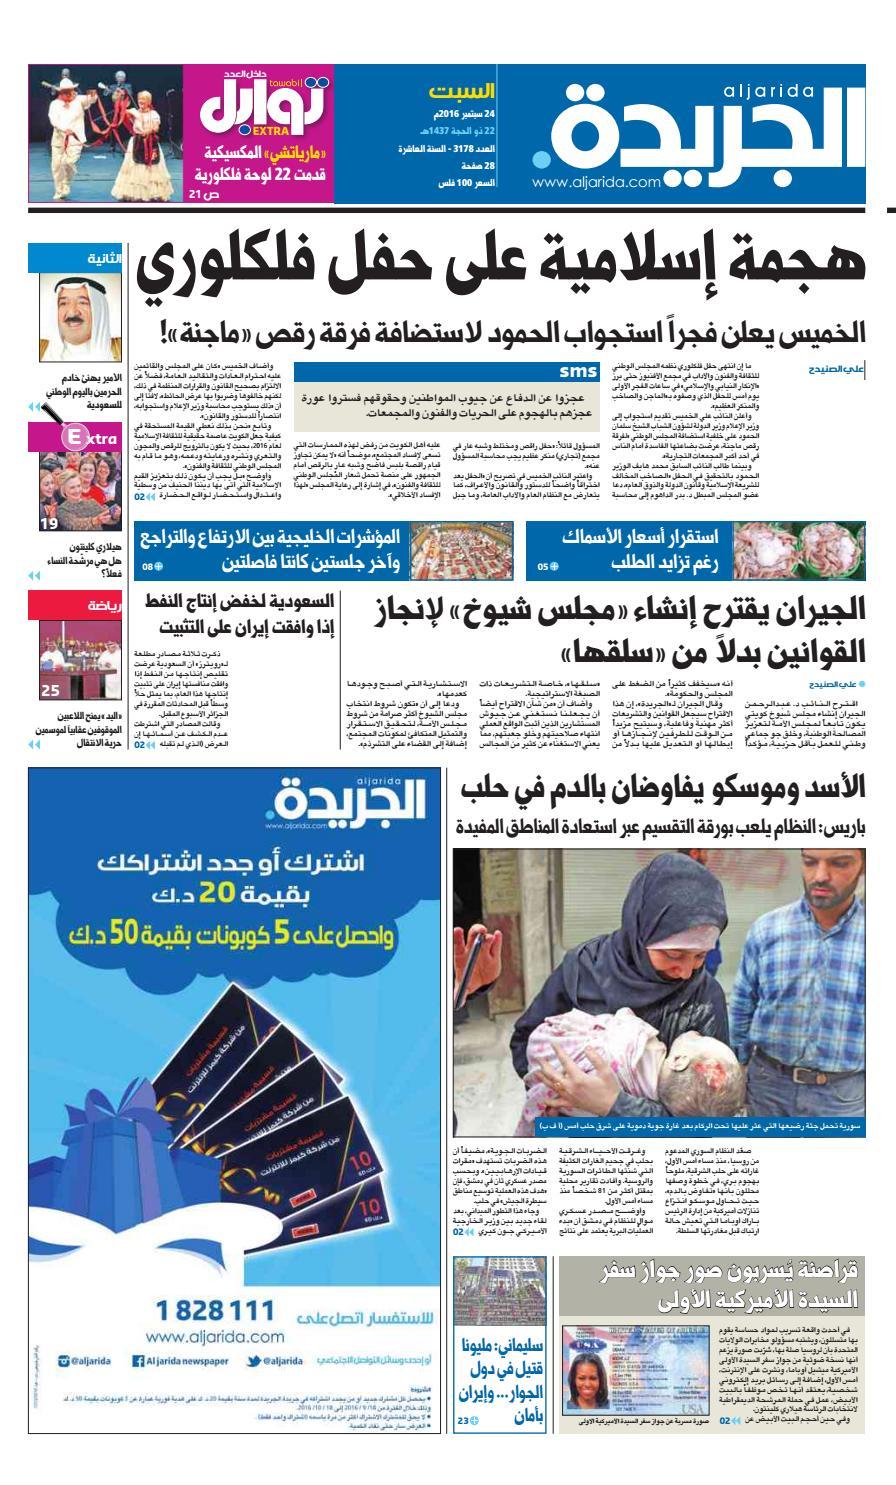 822edcc4ff7b0 2016 عدد الجريدة 24 سبتمبر by Aljarida Newspaper - issuu